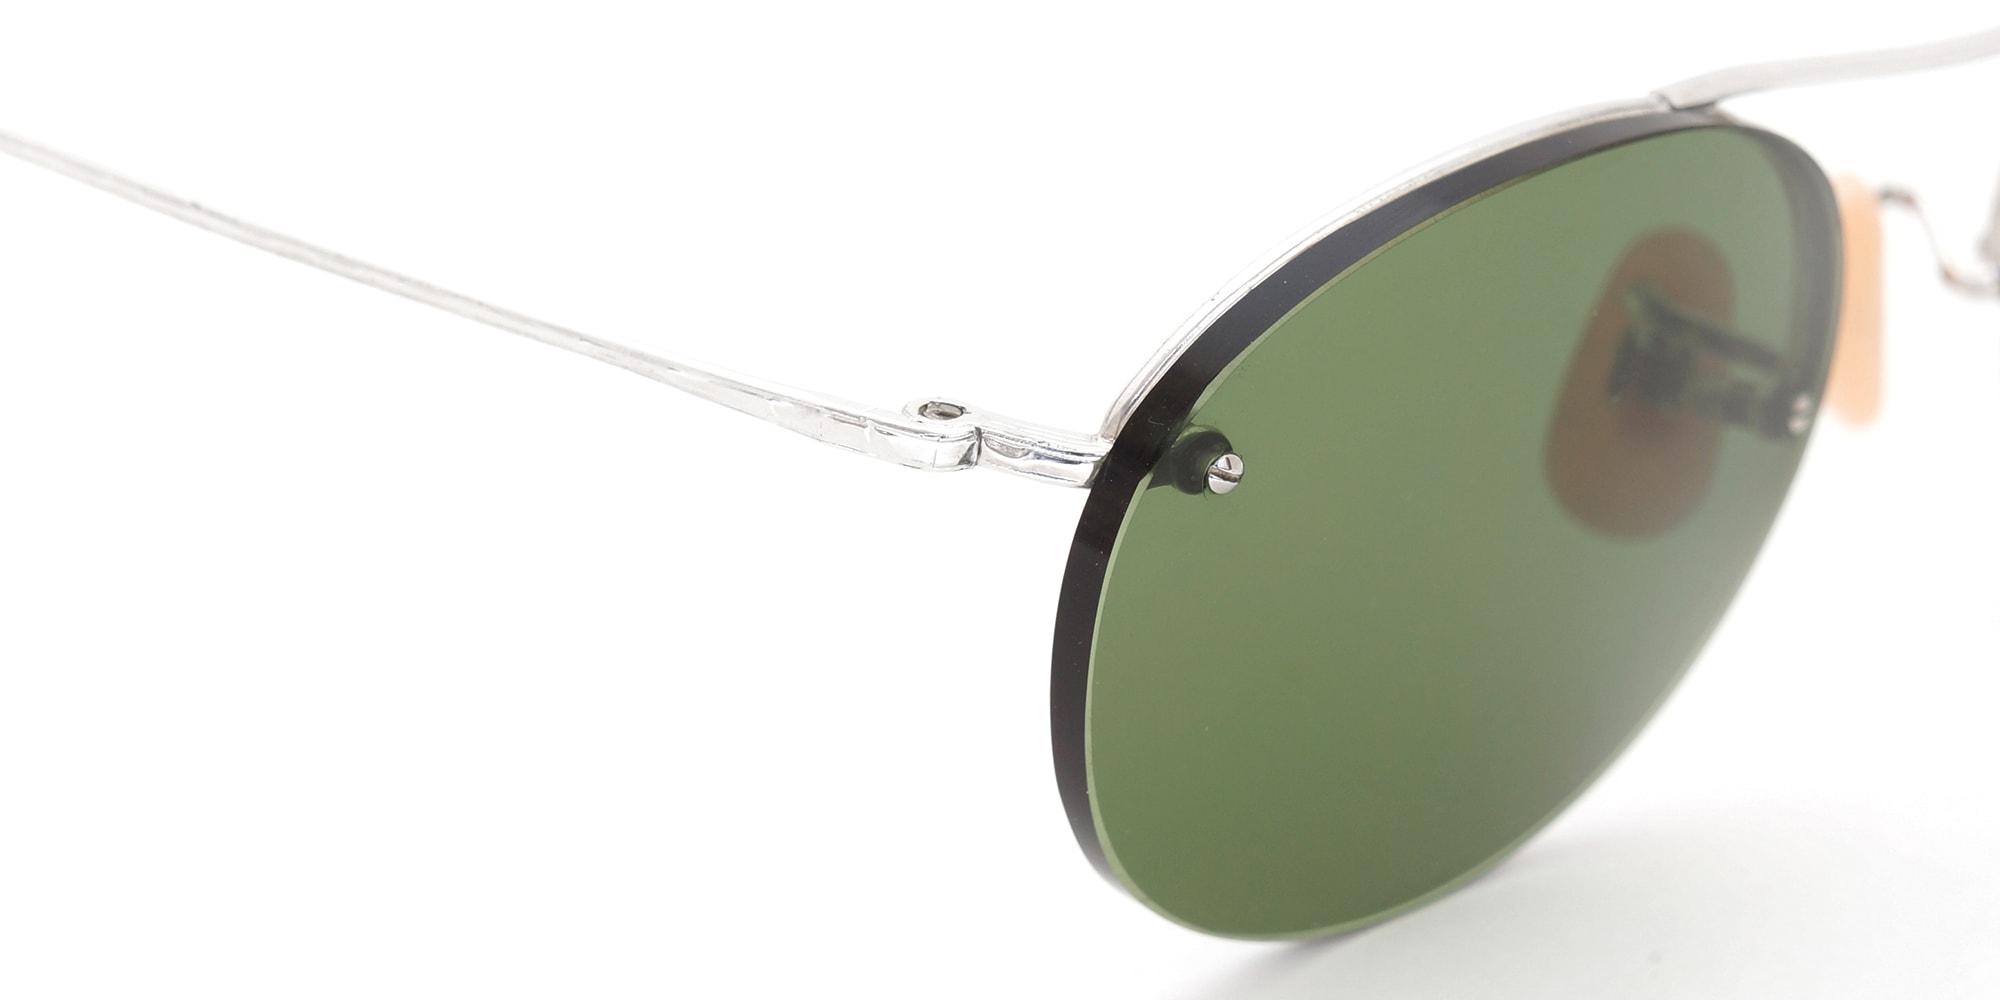 The Spectacle サングラス 1938-1950s SHURON Mid-Century-Modern-Bar 1/10 12KGF 44/20 イメージ6